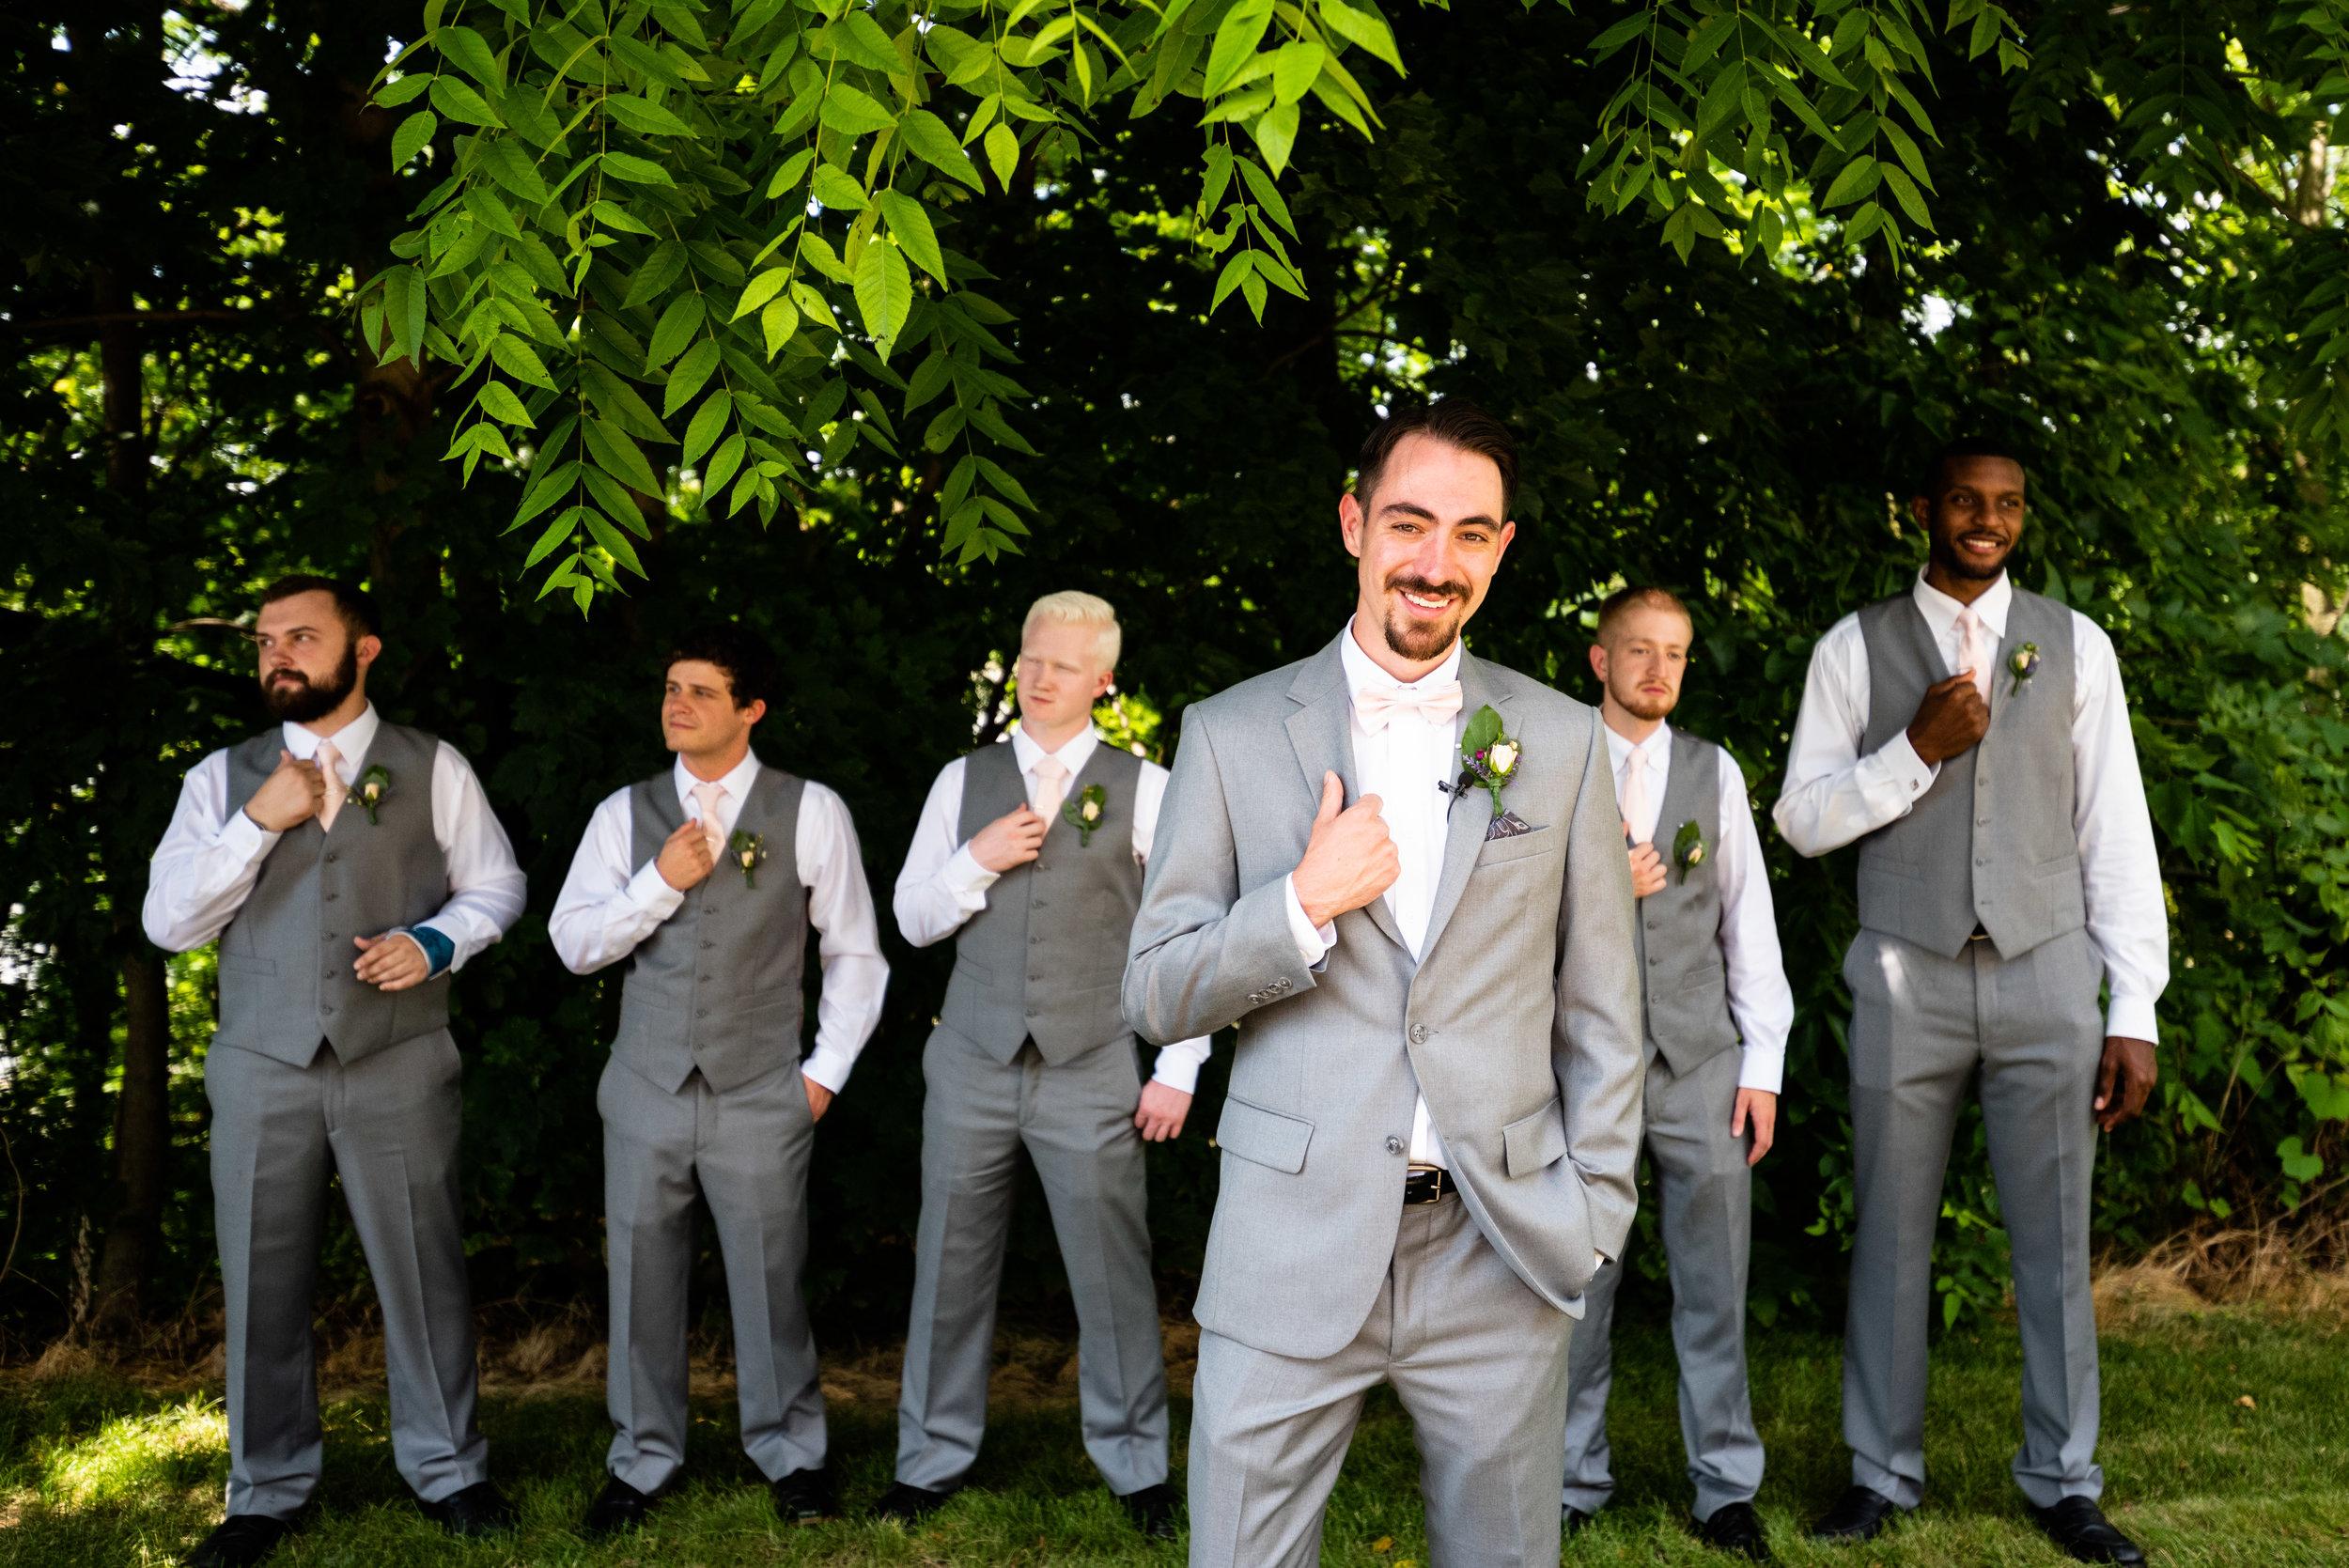 toledo ohio wedding photographer